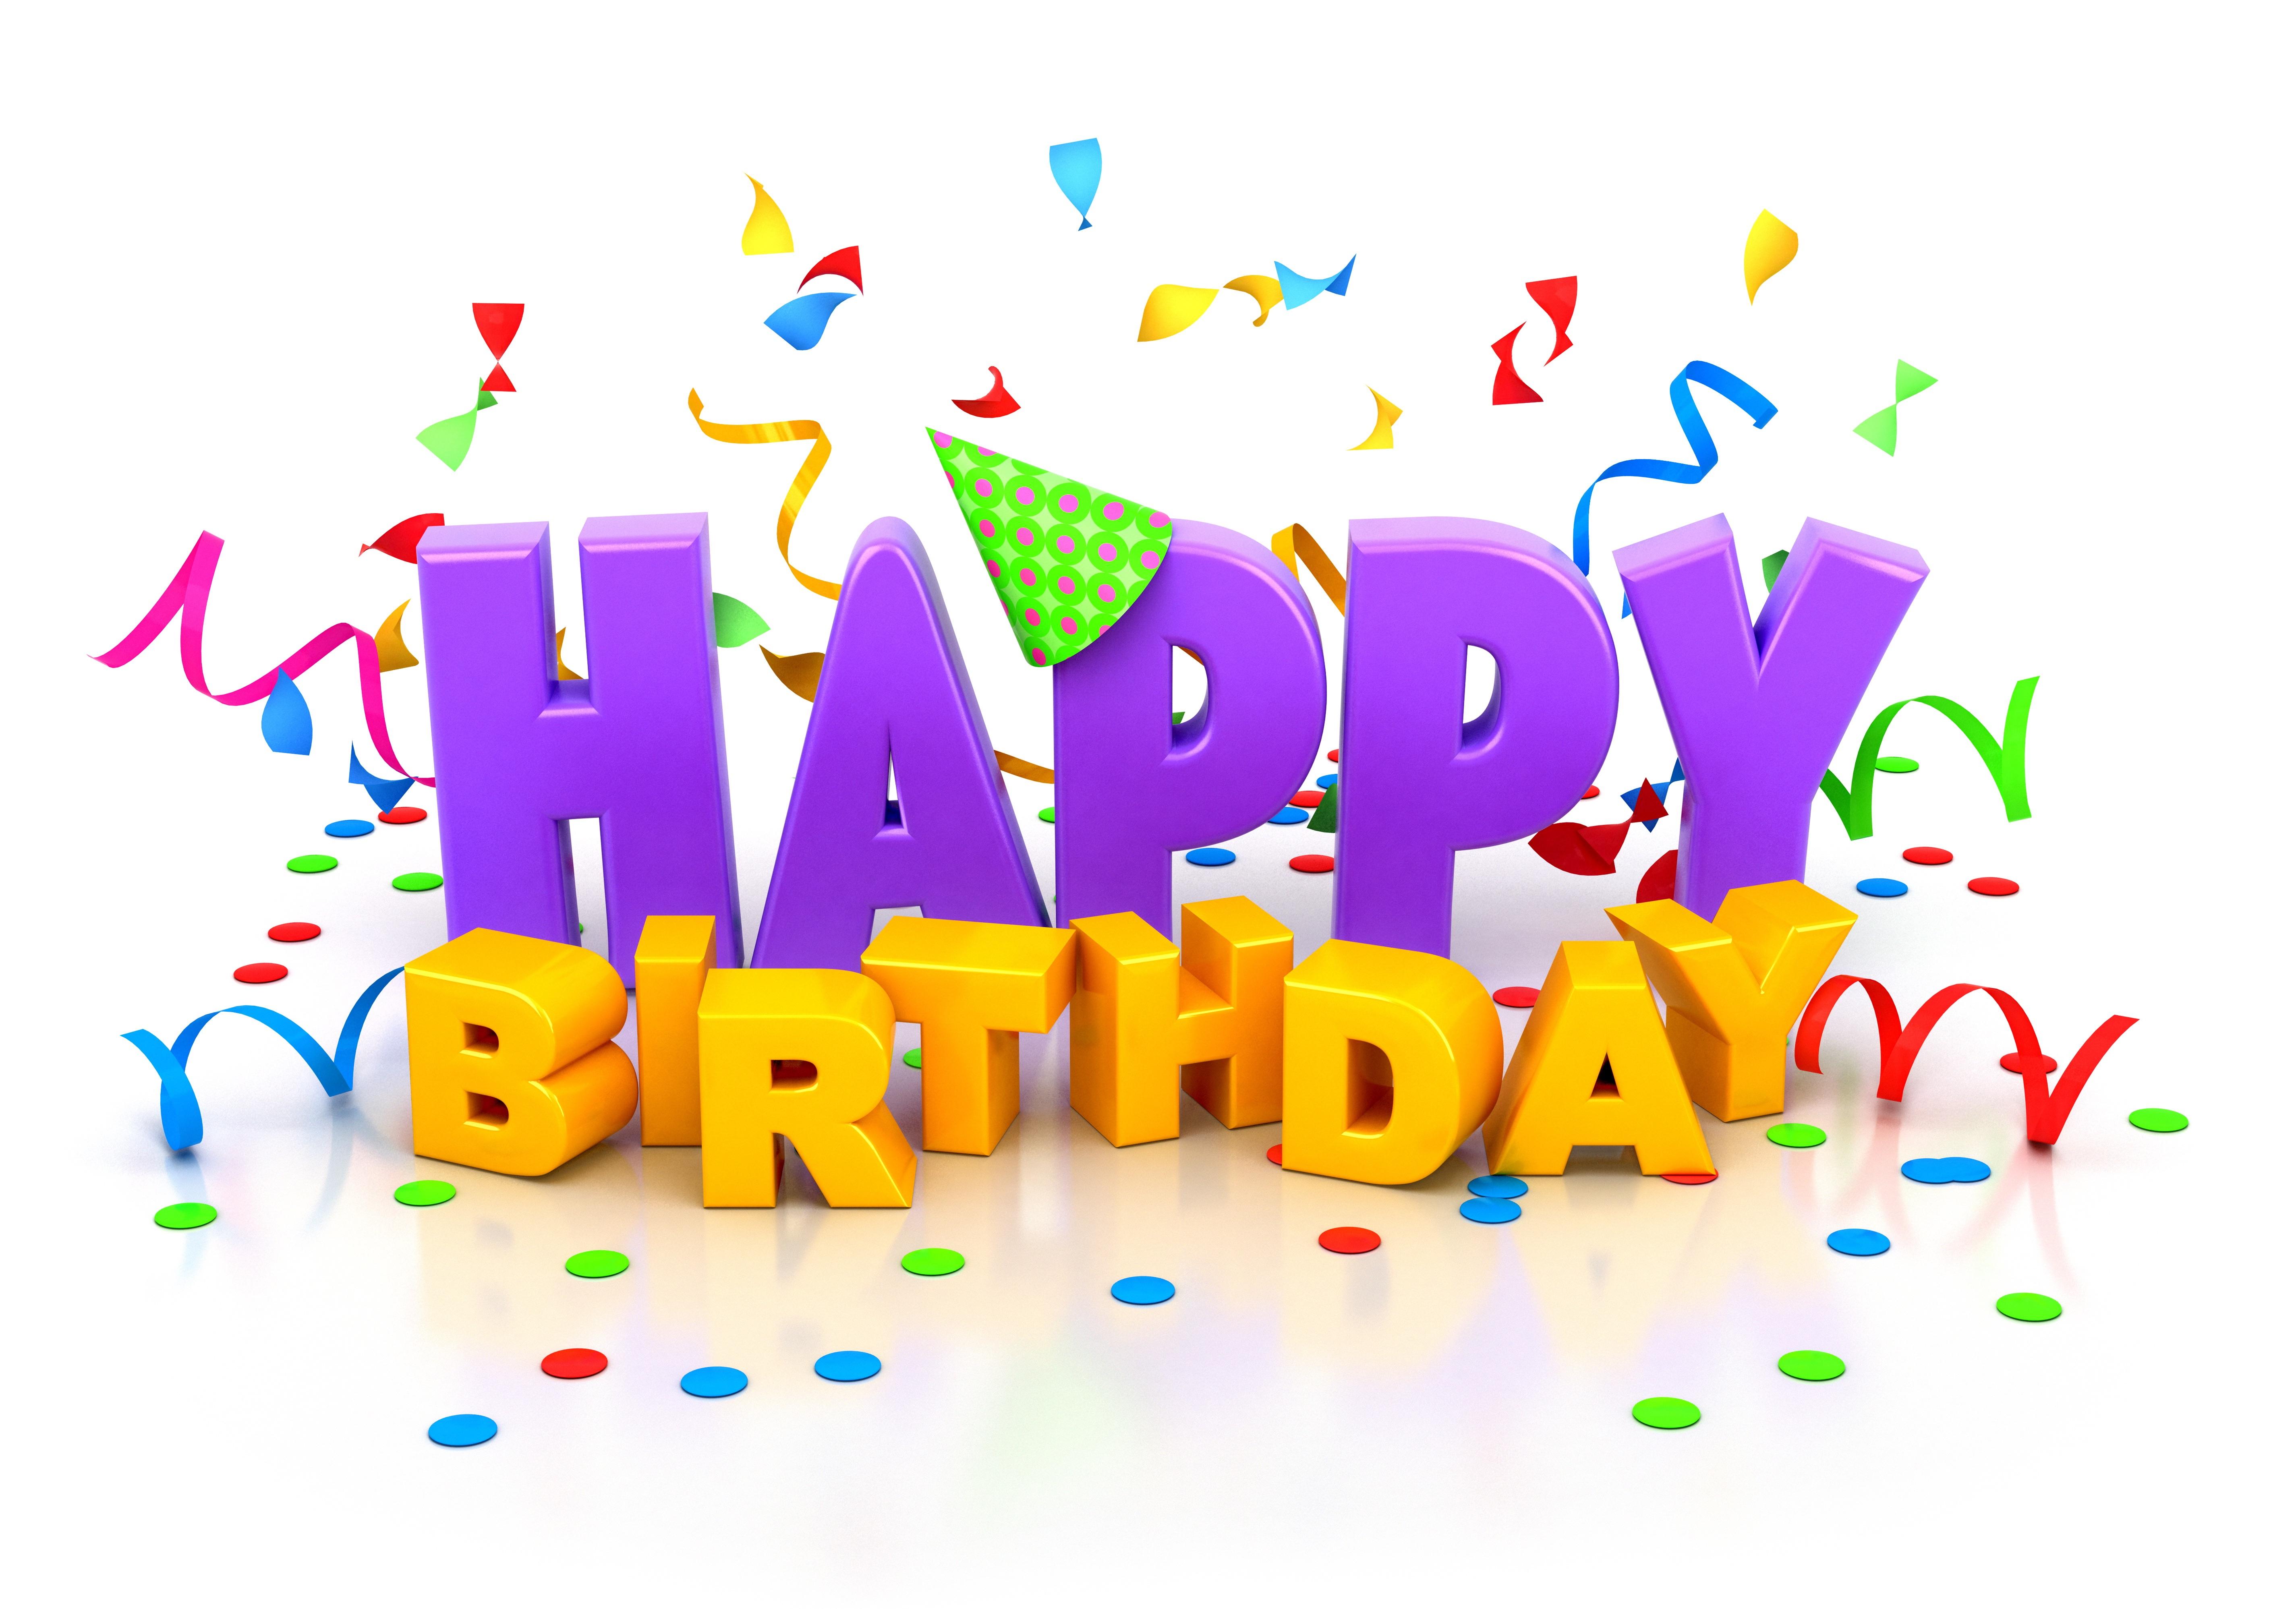 Louis Yung 7 Happy Birthday Polina We Wish You All The Best Happy Birthday Wish You All The Best In